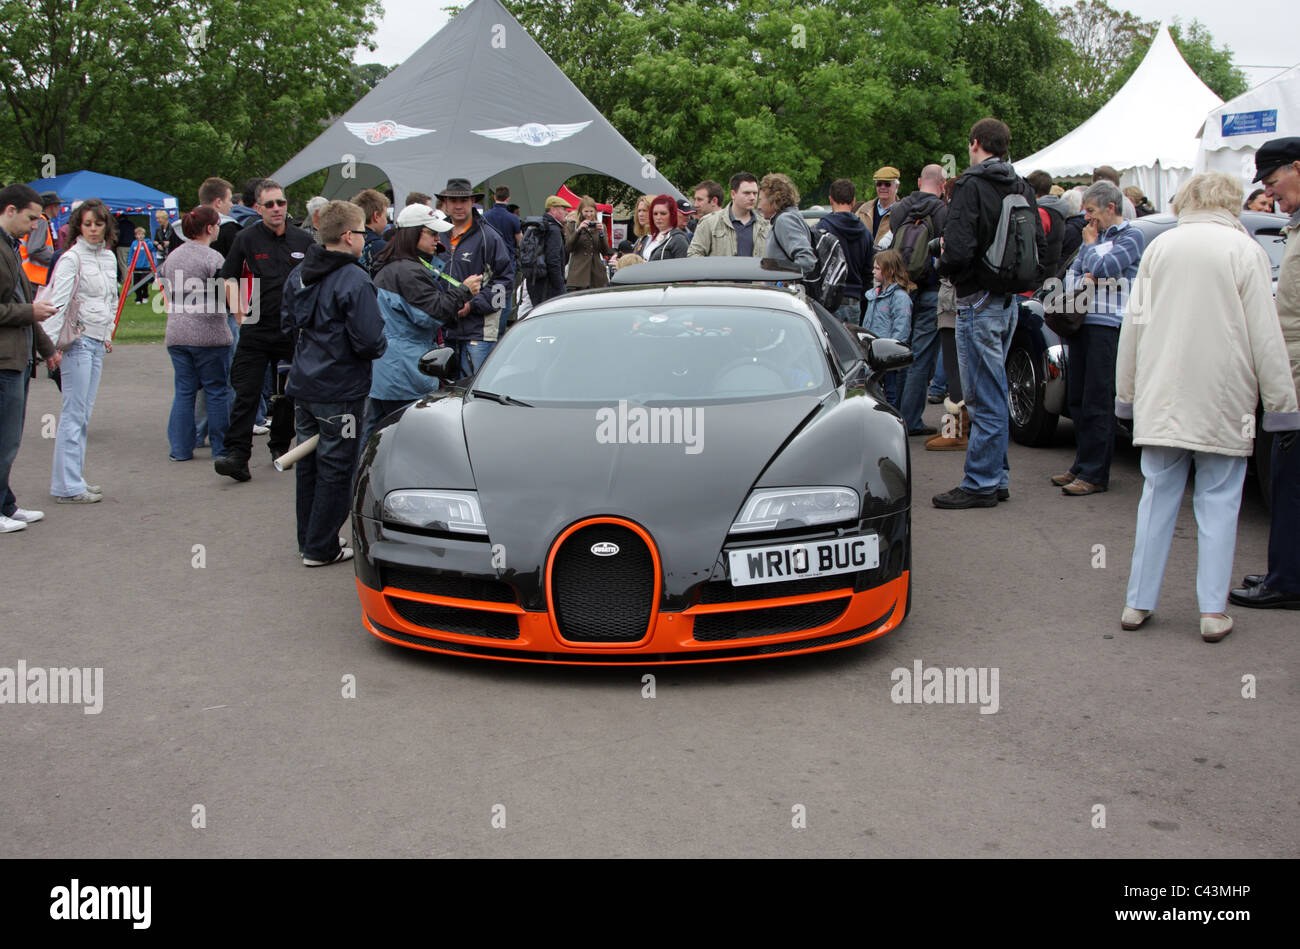 High Quality A £1.5 Million Bugatti Veyron Super Sport At Prescott Hill Climb In  Gloucestershire UK.